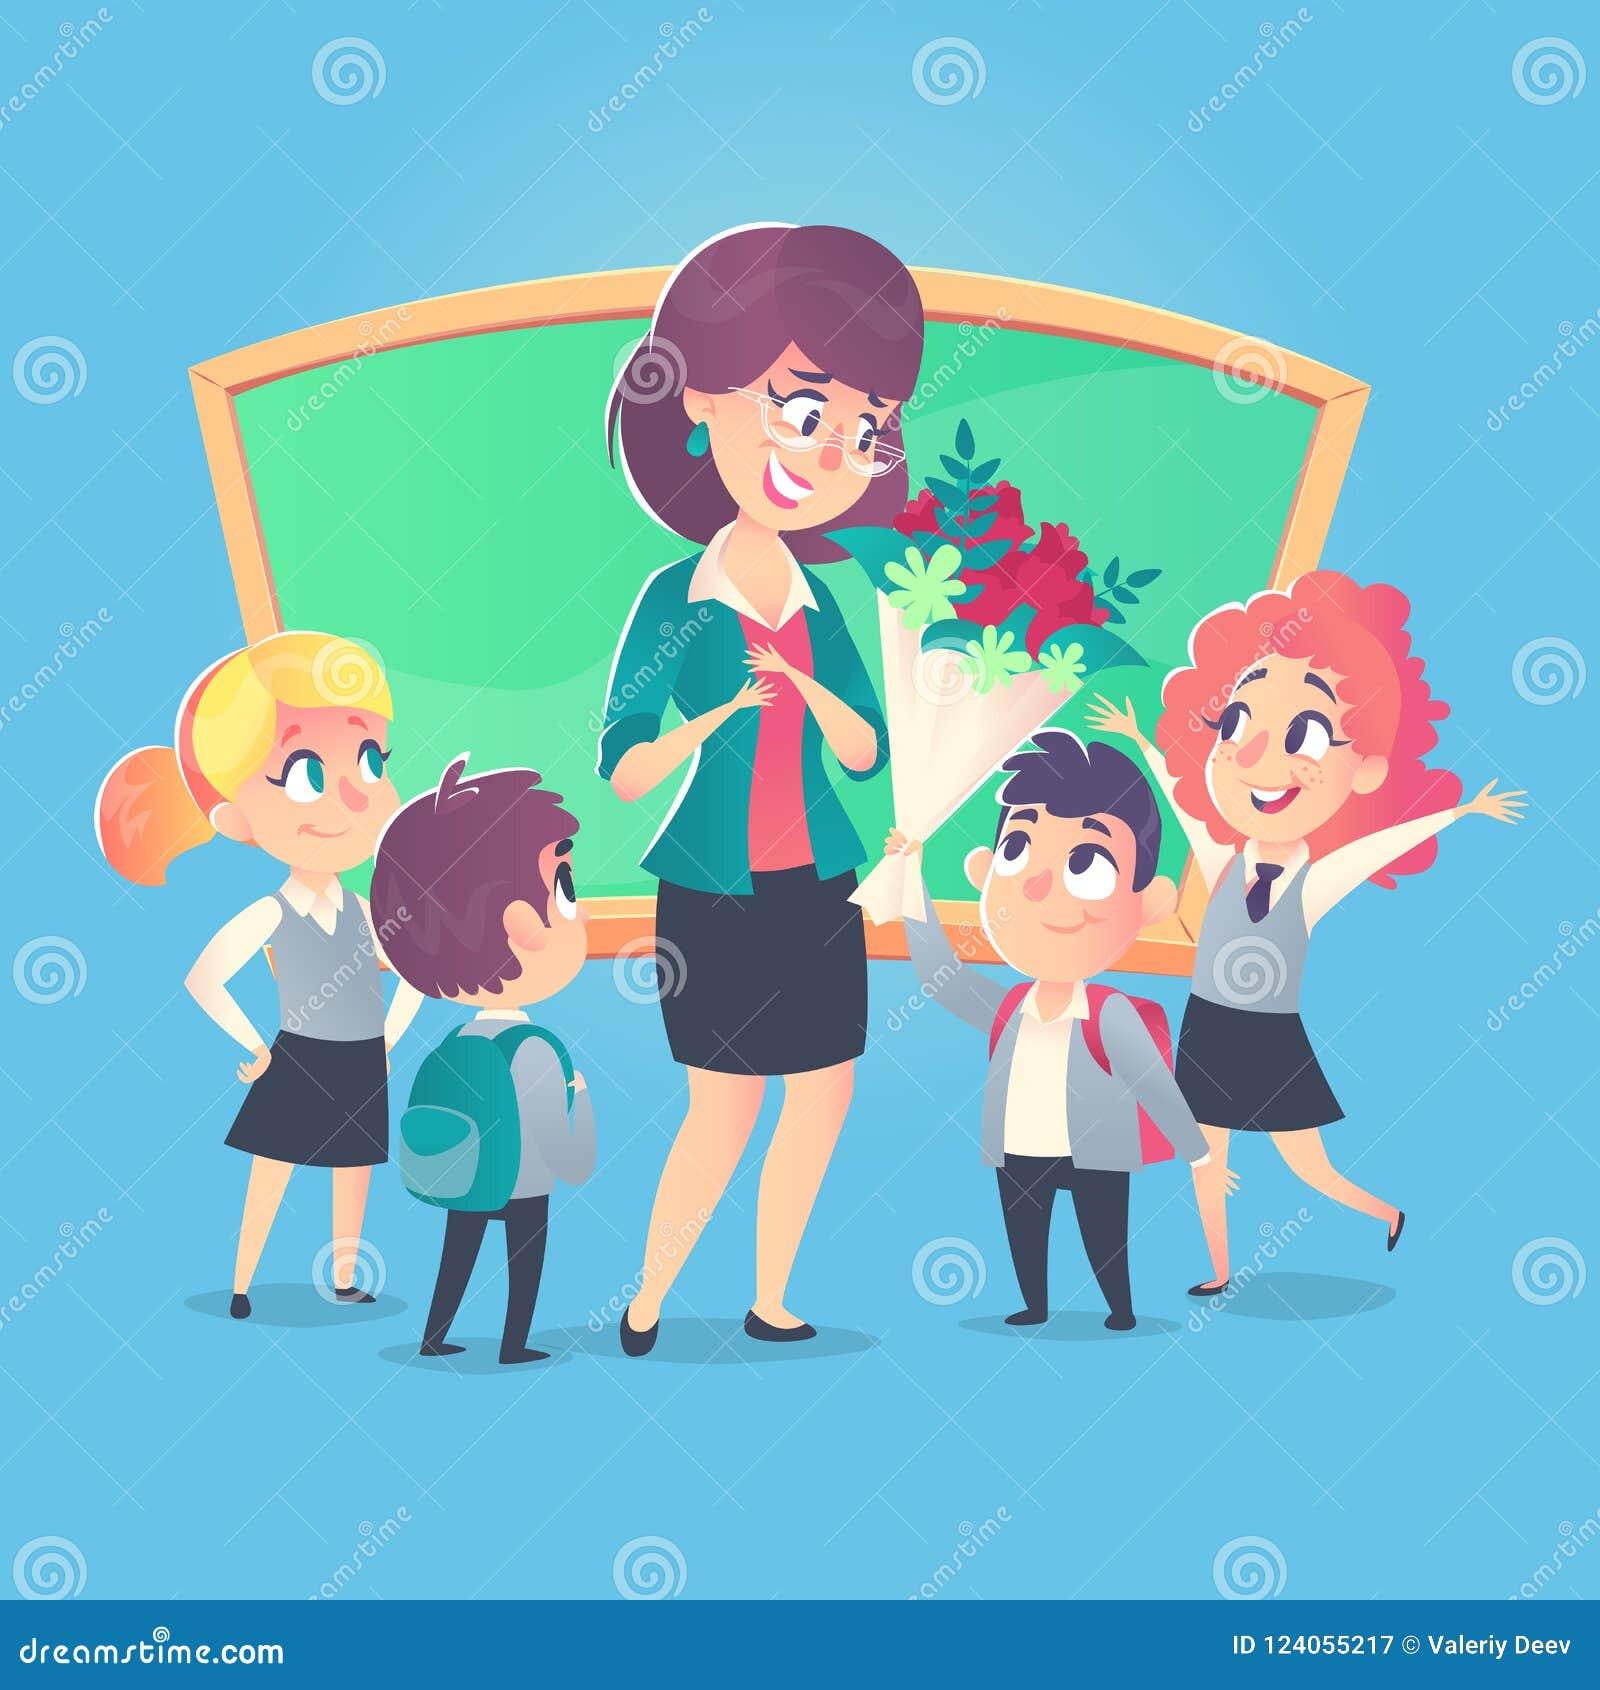 Schoolchildren Give Flowers To The Happy Teacher In